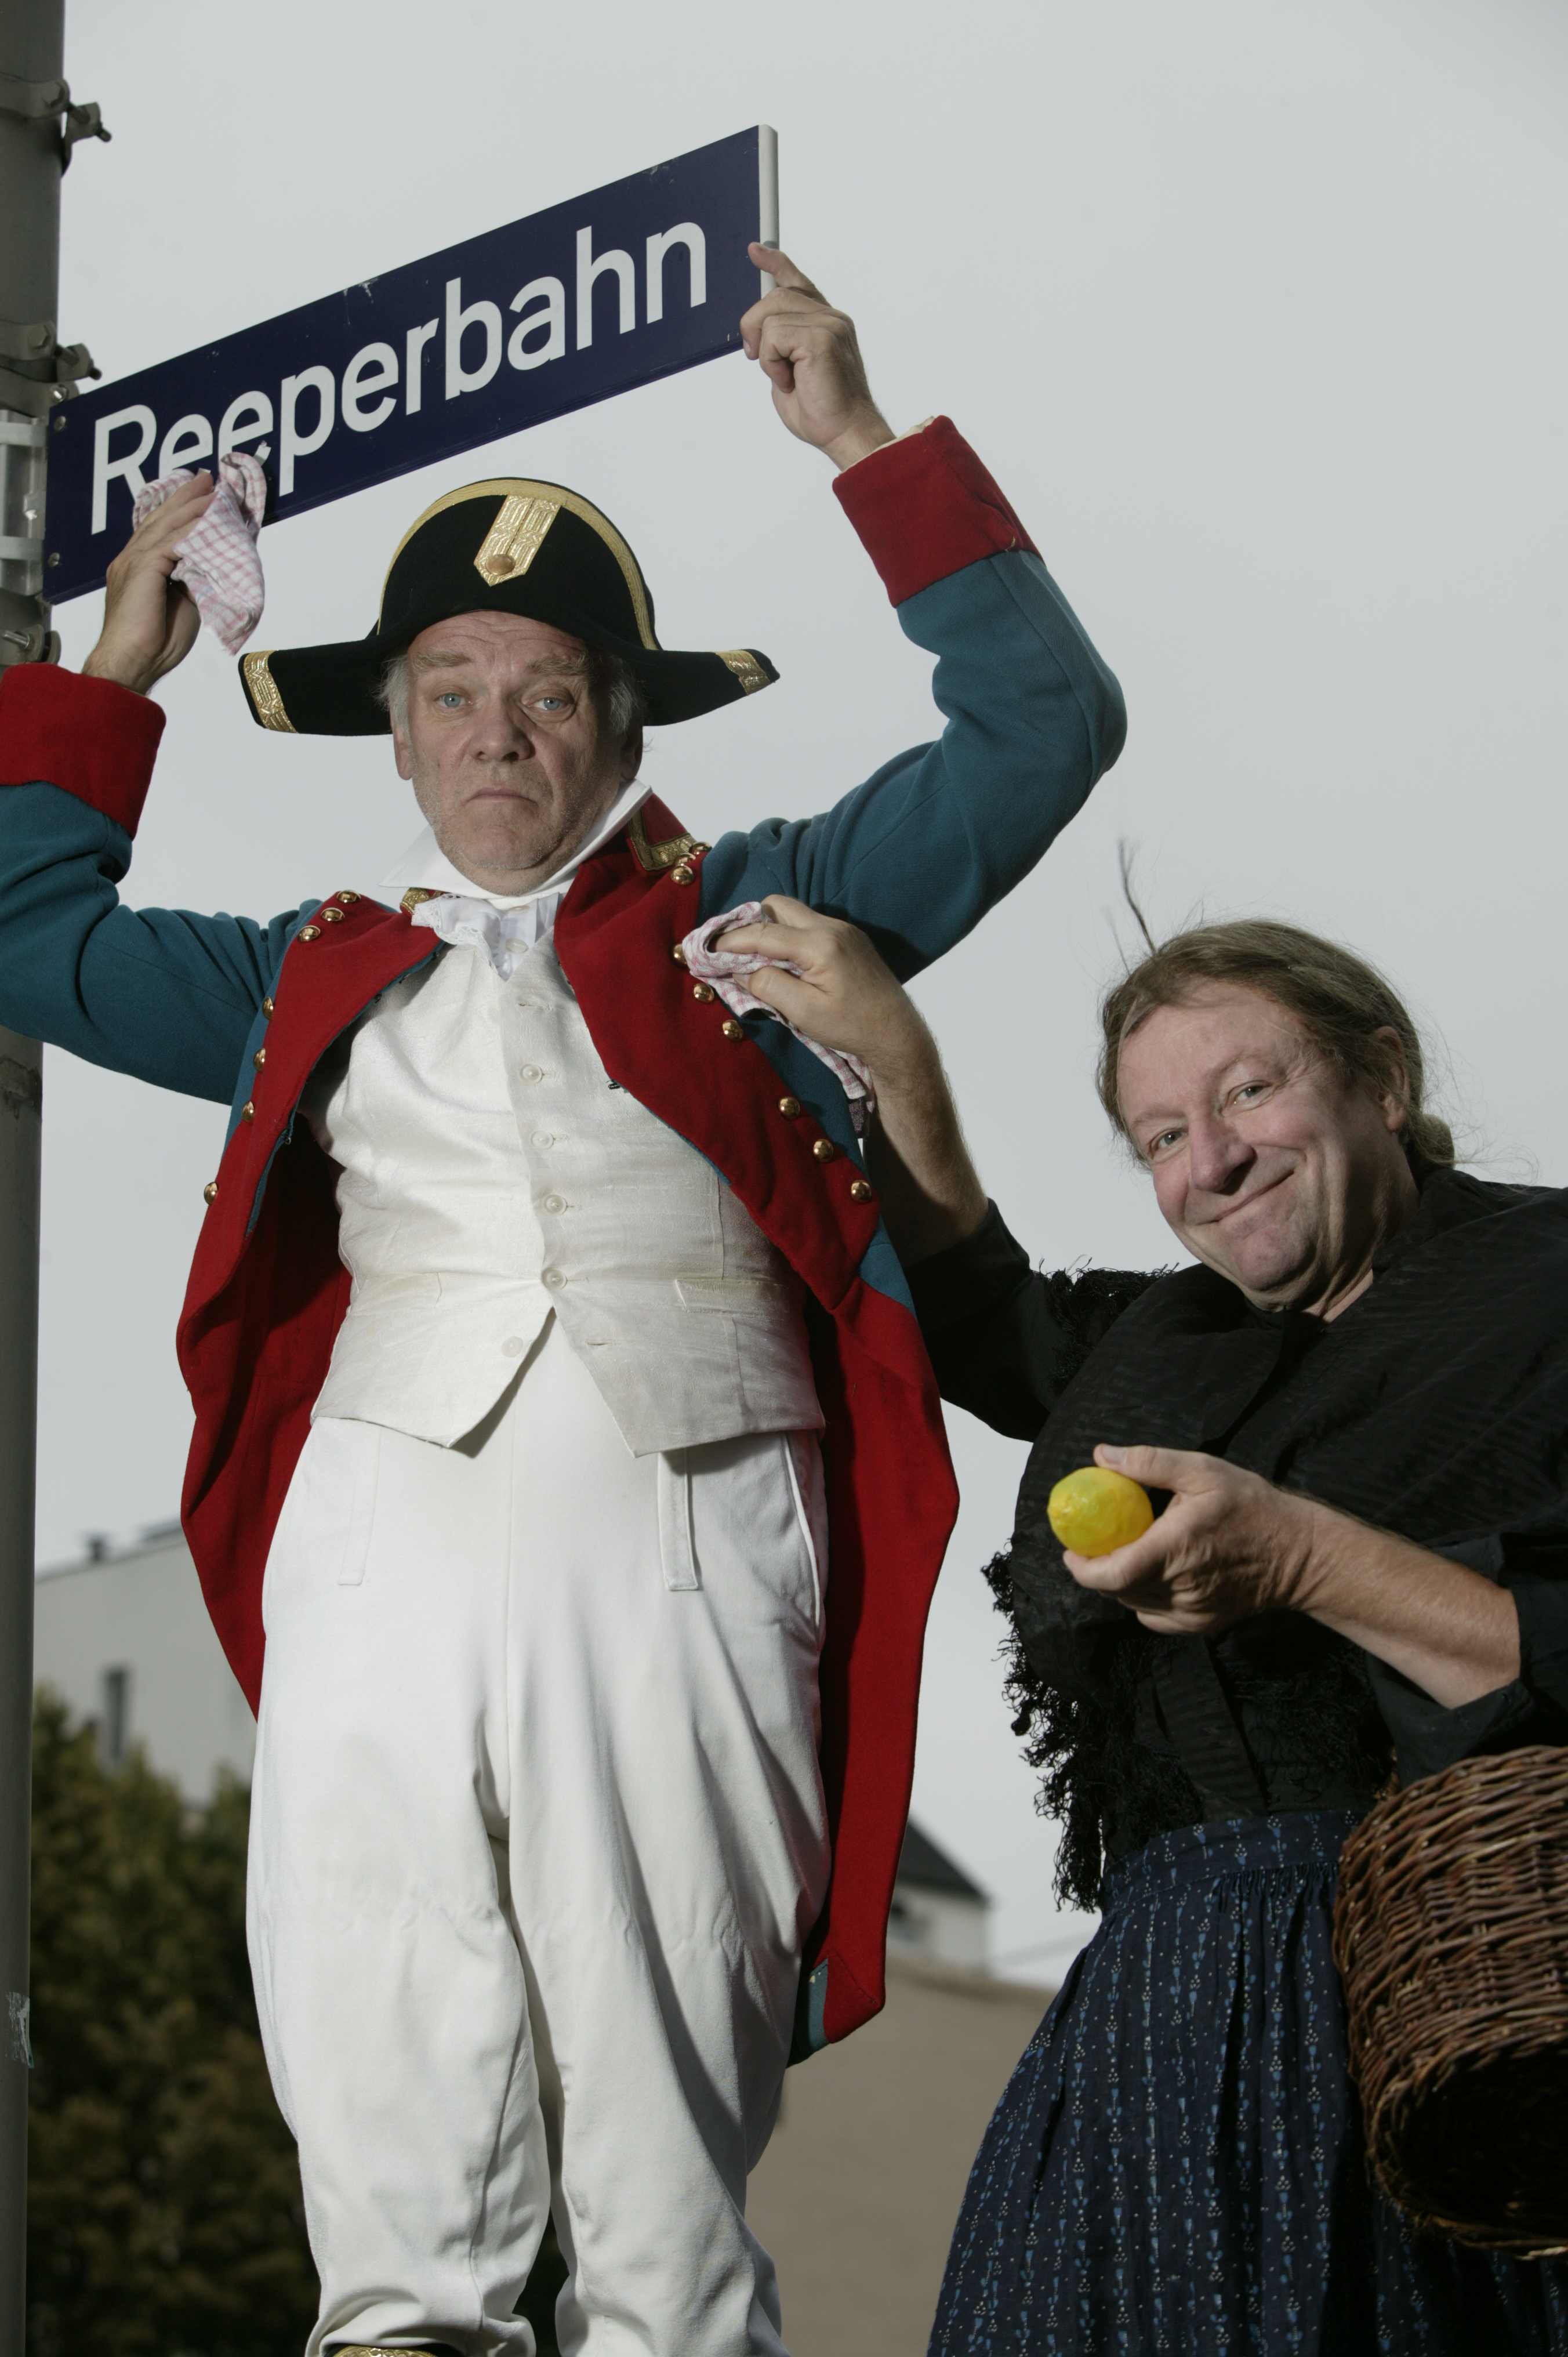 Auf der Reeperbahn - Die St. Pauli Revue - Peter Franke und Gerhard Garbers - Foto: Stefan Malzkorn